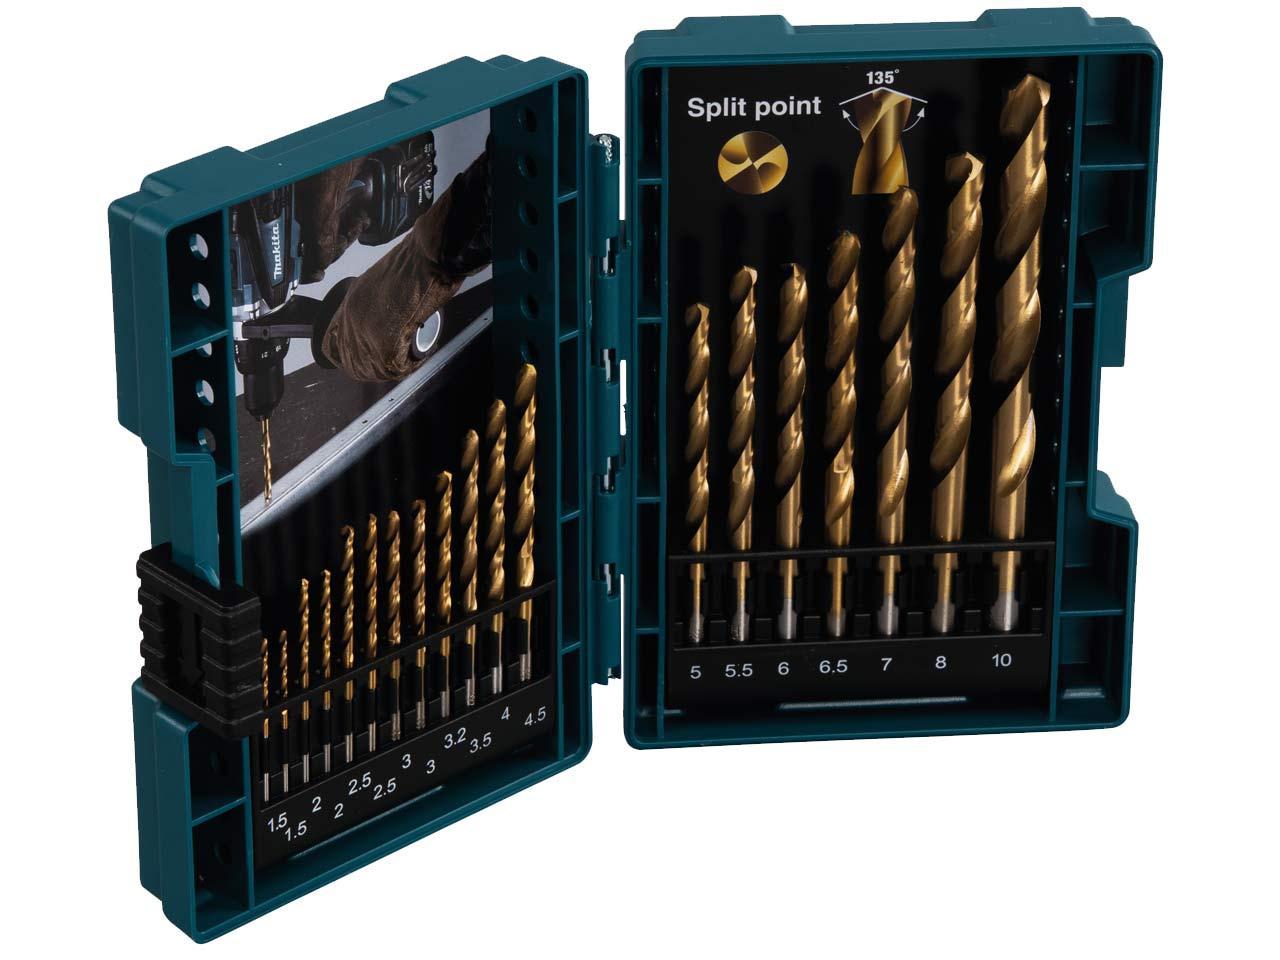 19 PIECE DRILL BIT SET TITANIUM NITRIDE COATED SIZES 1-10mm IN METAL CASE